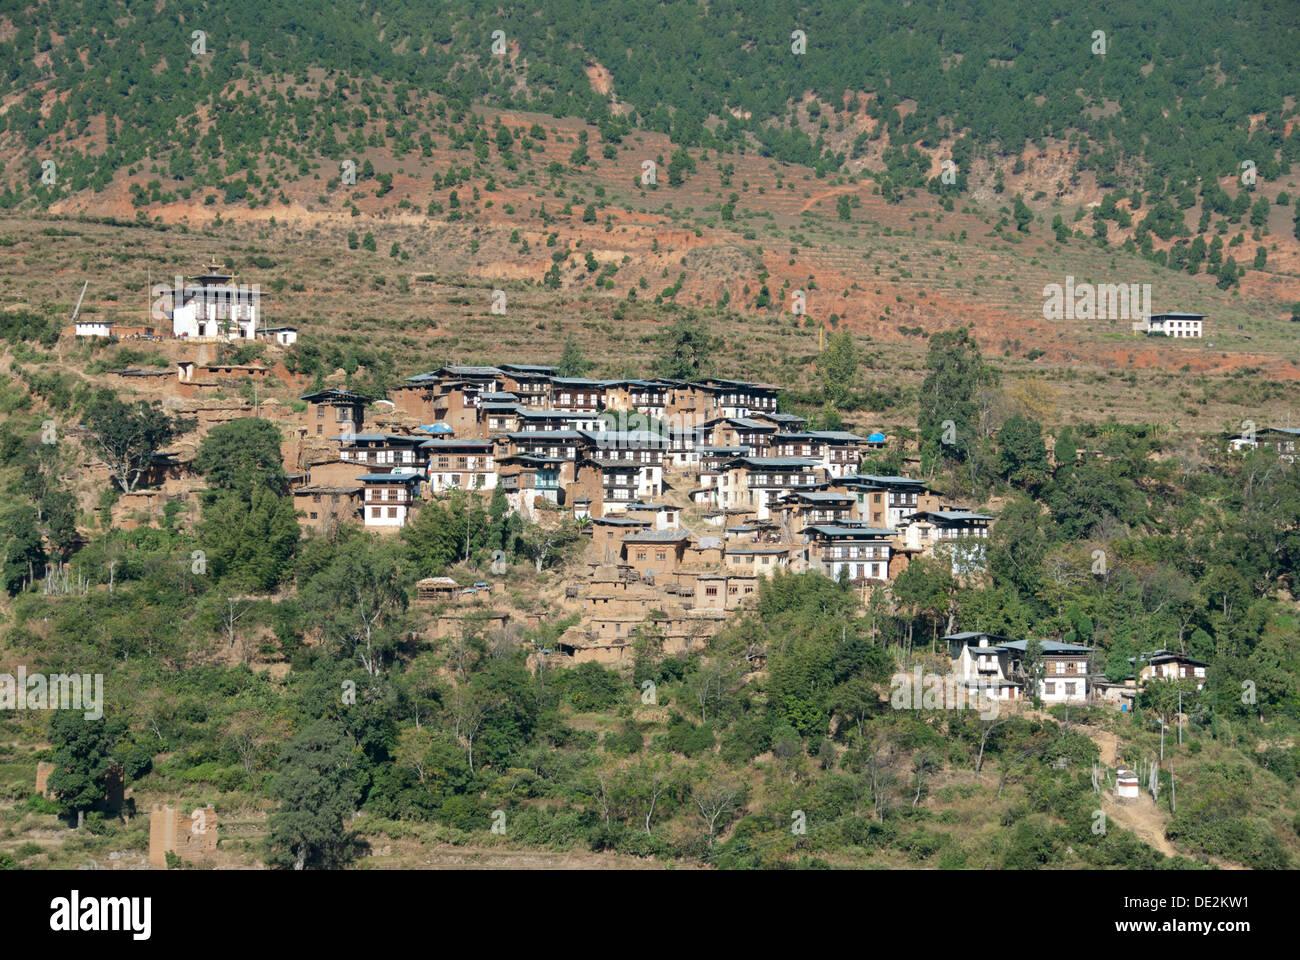 Typical village built on a hillside near Wangdue Phodrang near Punakha, Himalaya, Kingdom of Bhutan, South Asia, Asia - Stock Image